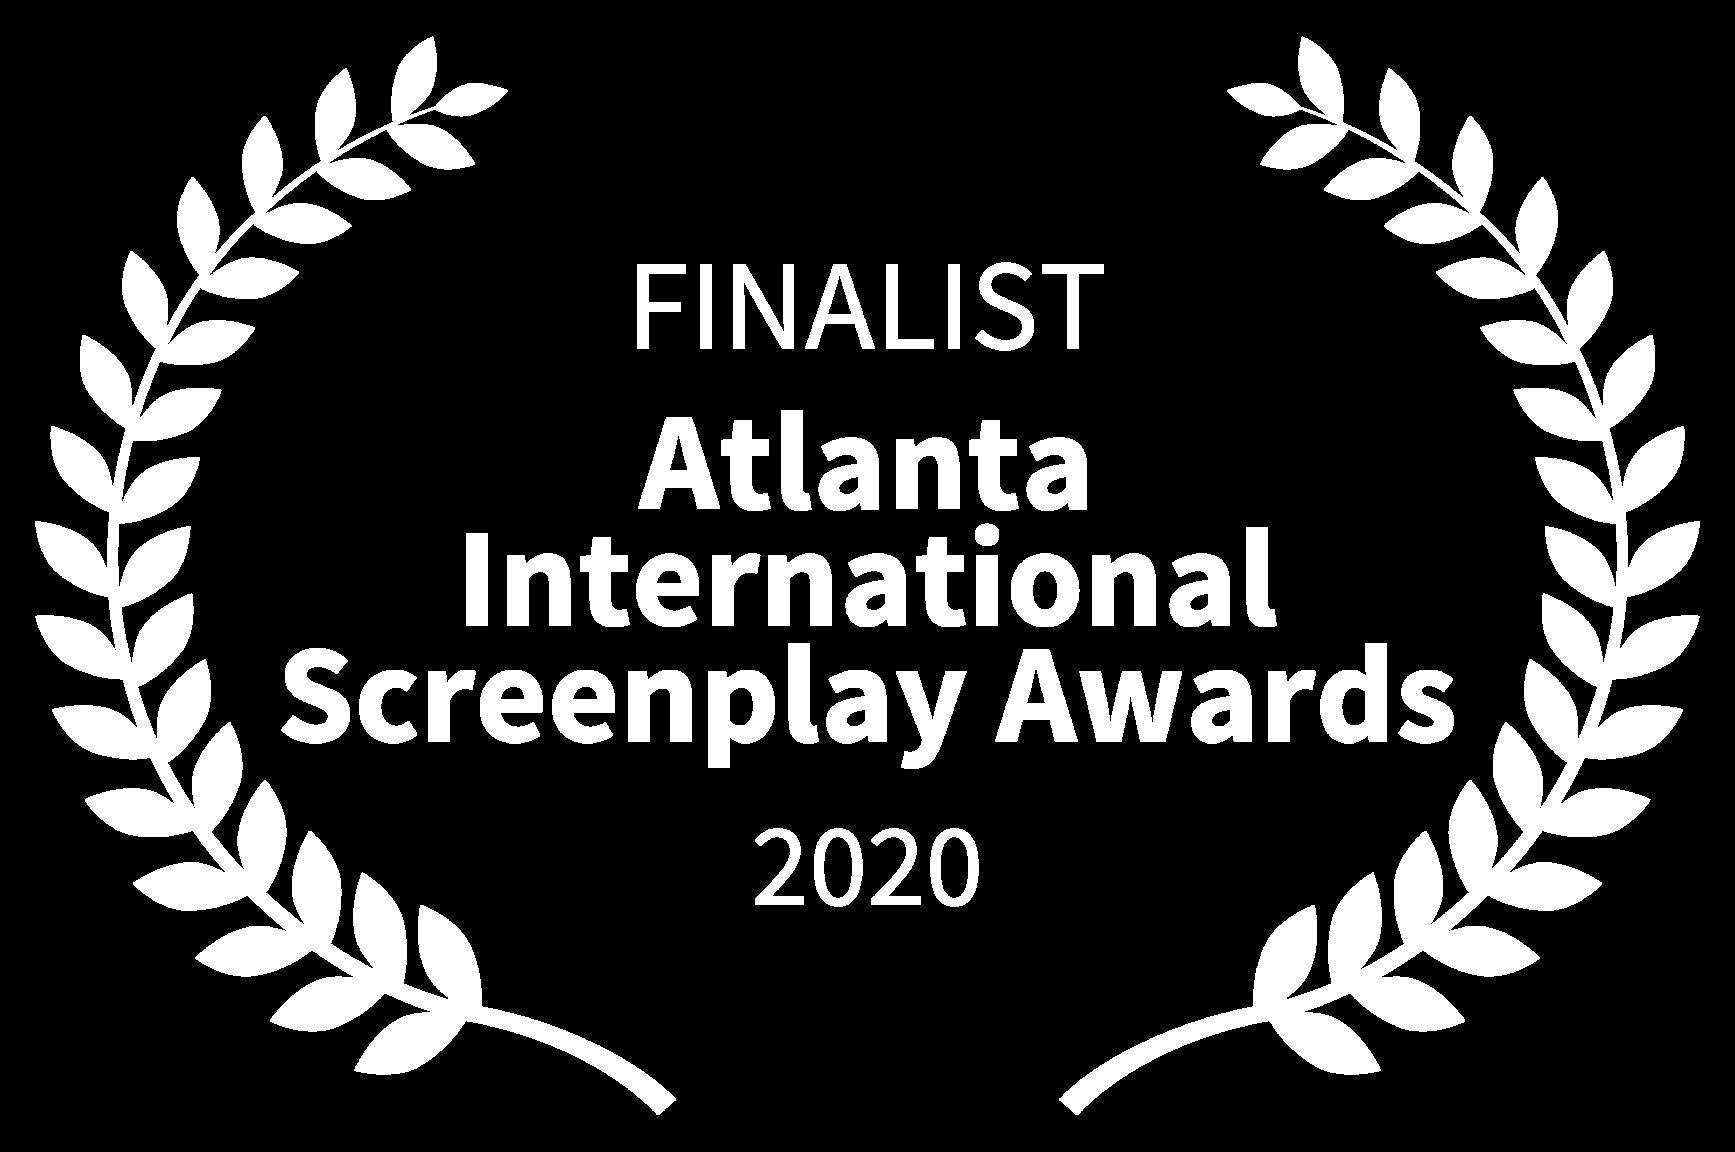 FINALIST - Atlanta International Screenplay Awards - 2020